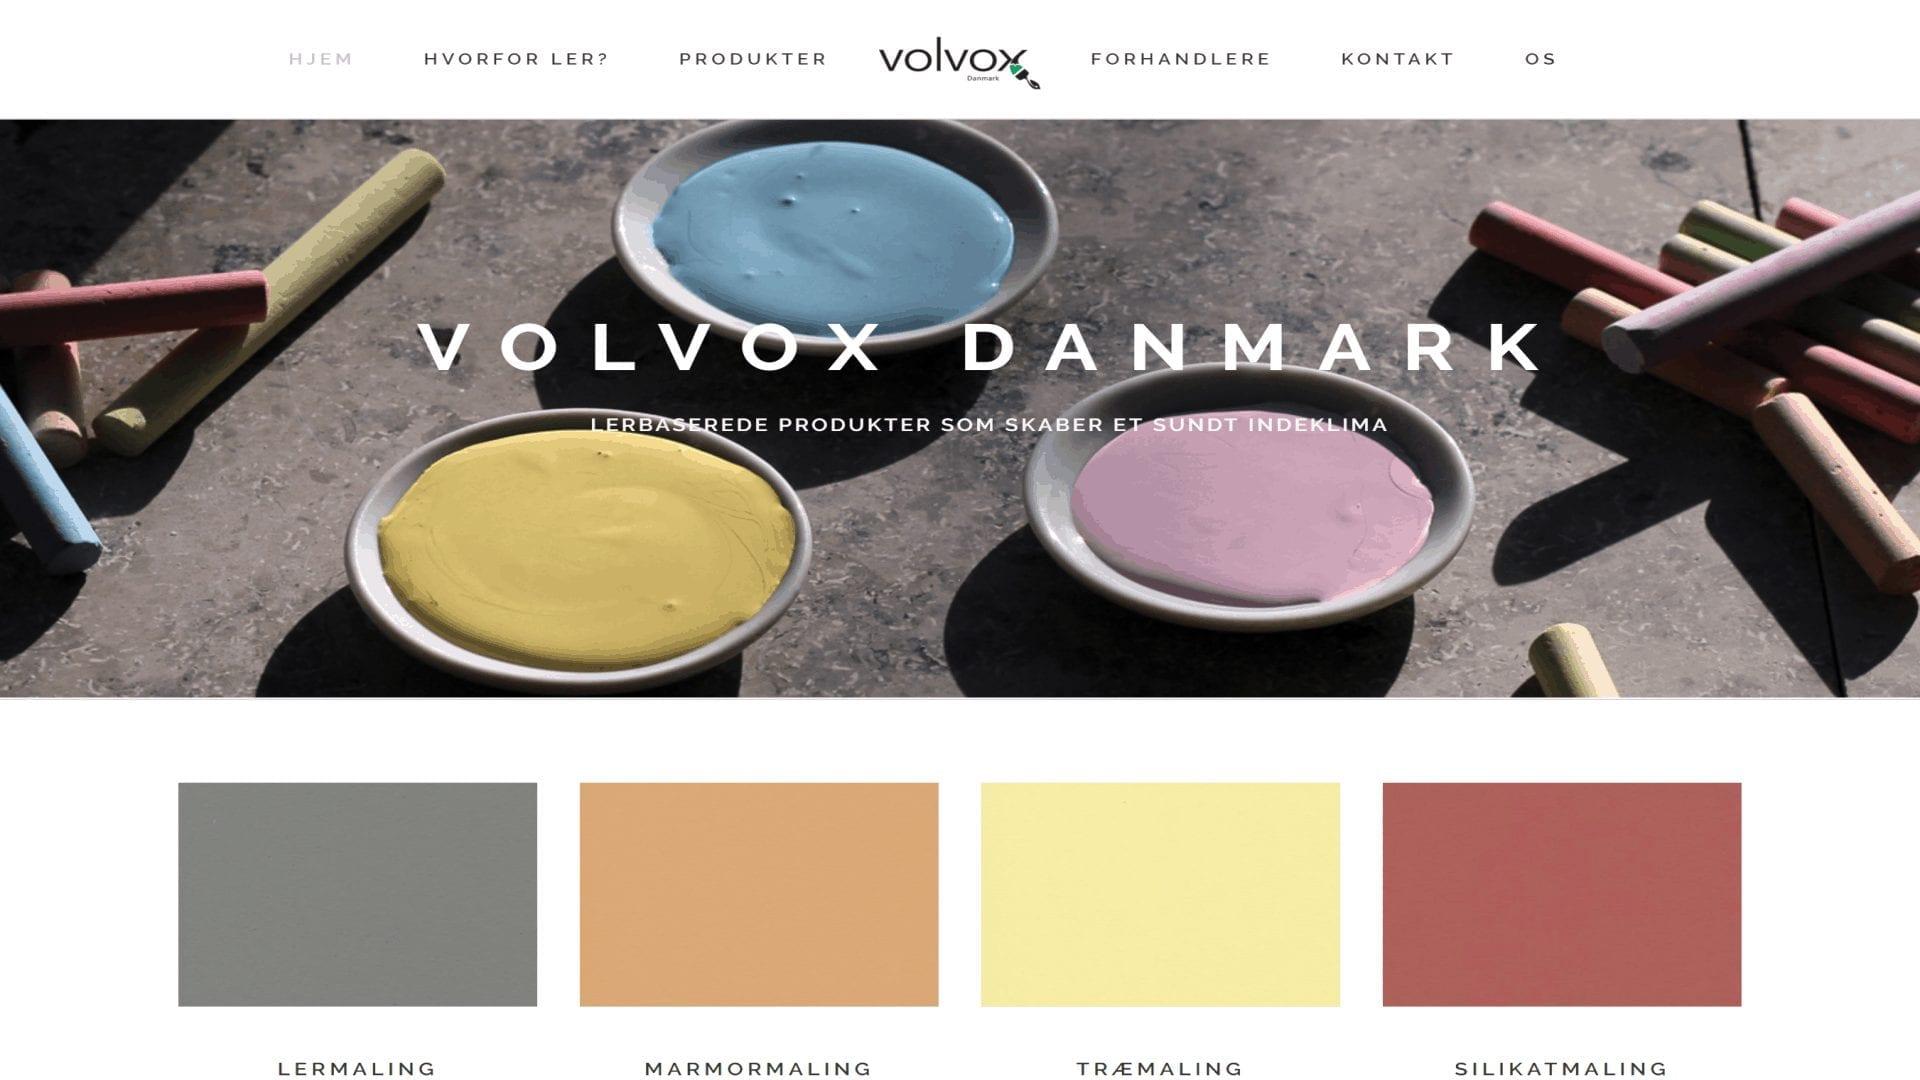 Volvox Danmark